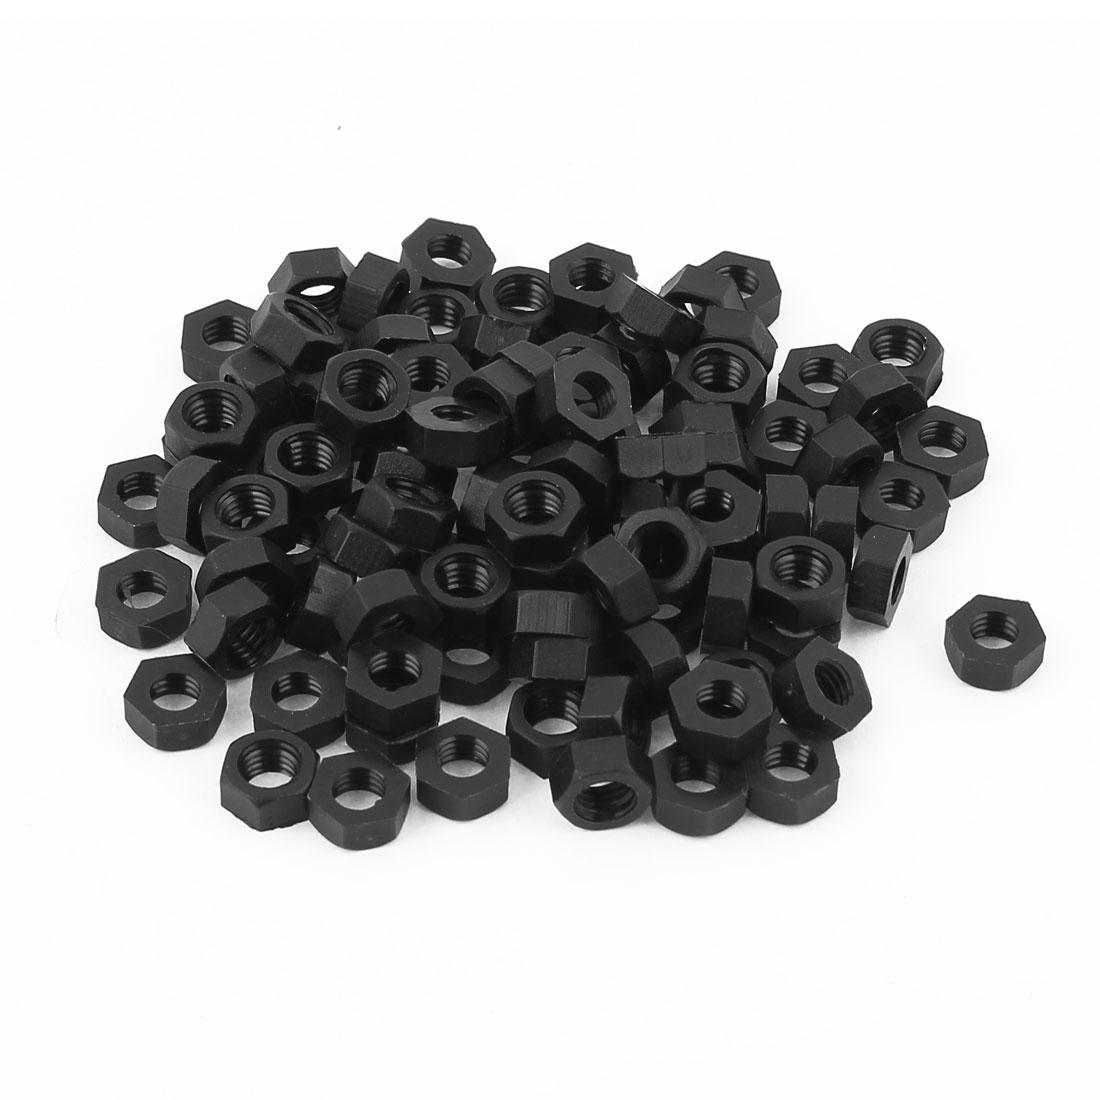 100pcs Metric M5x0.8mm Nylon Hexagon Fastener Hex Full Nuts Black